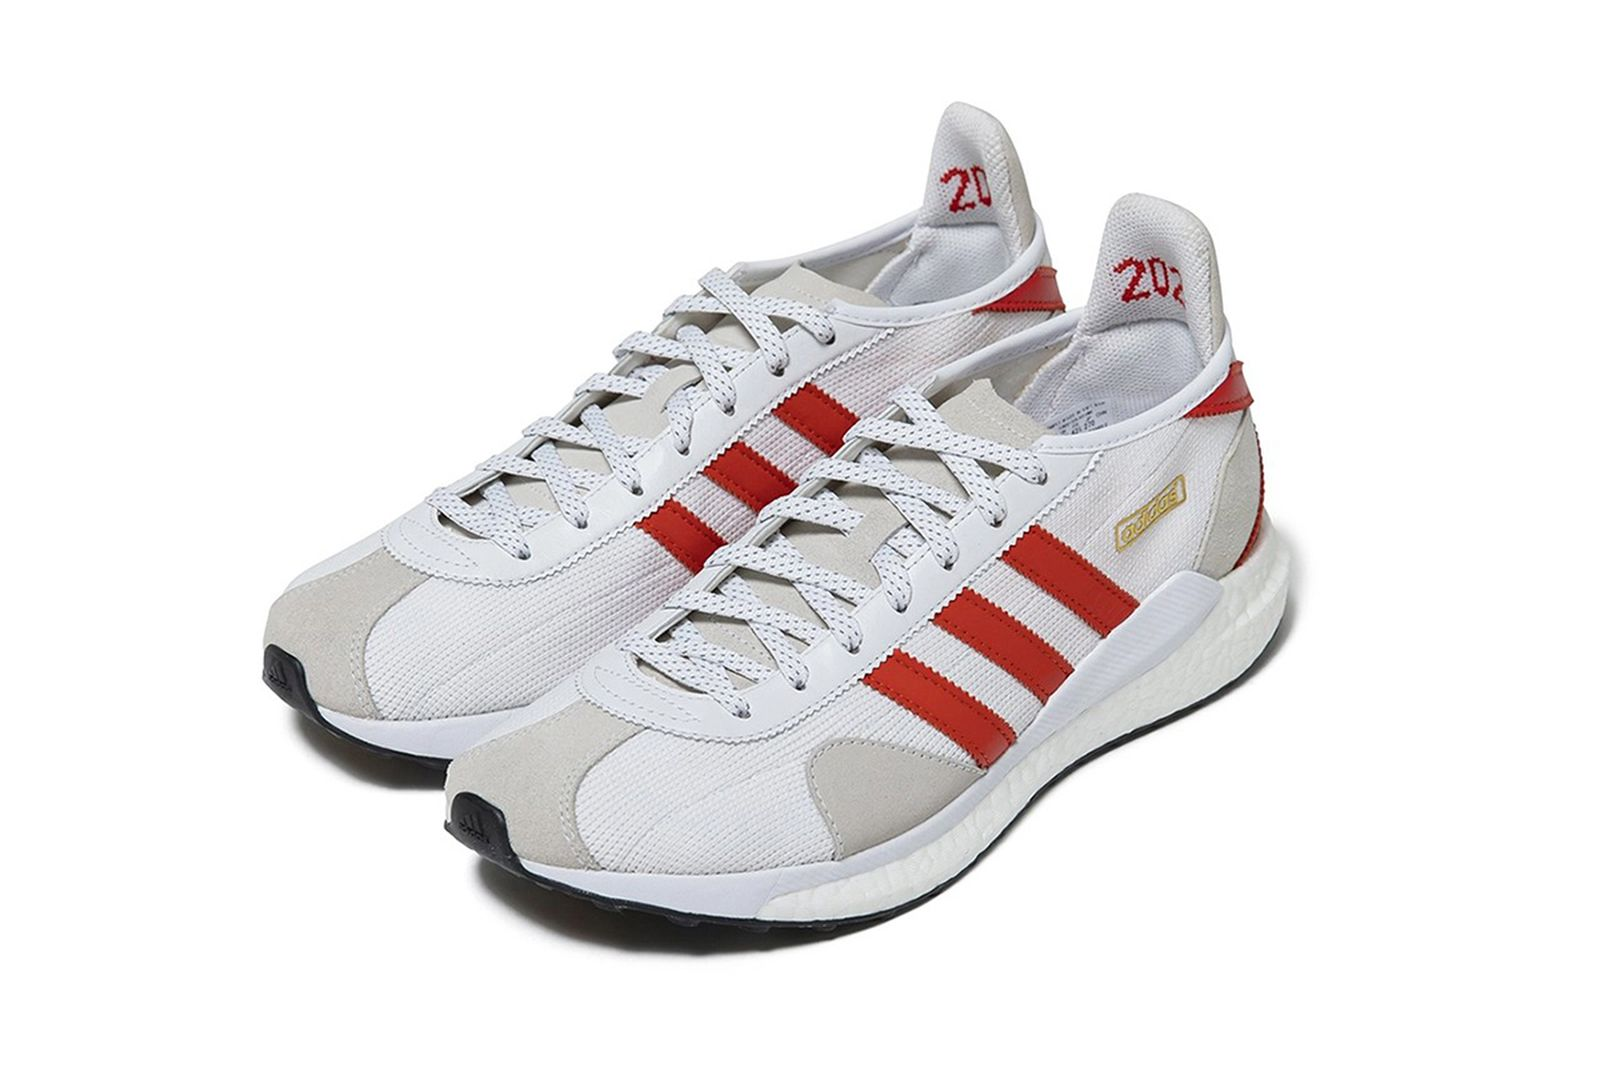 human-made-adidas-tokio-solar-release-date-price-05